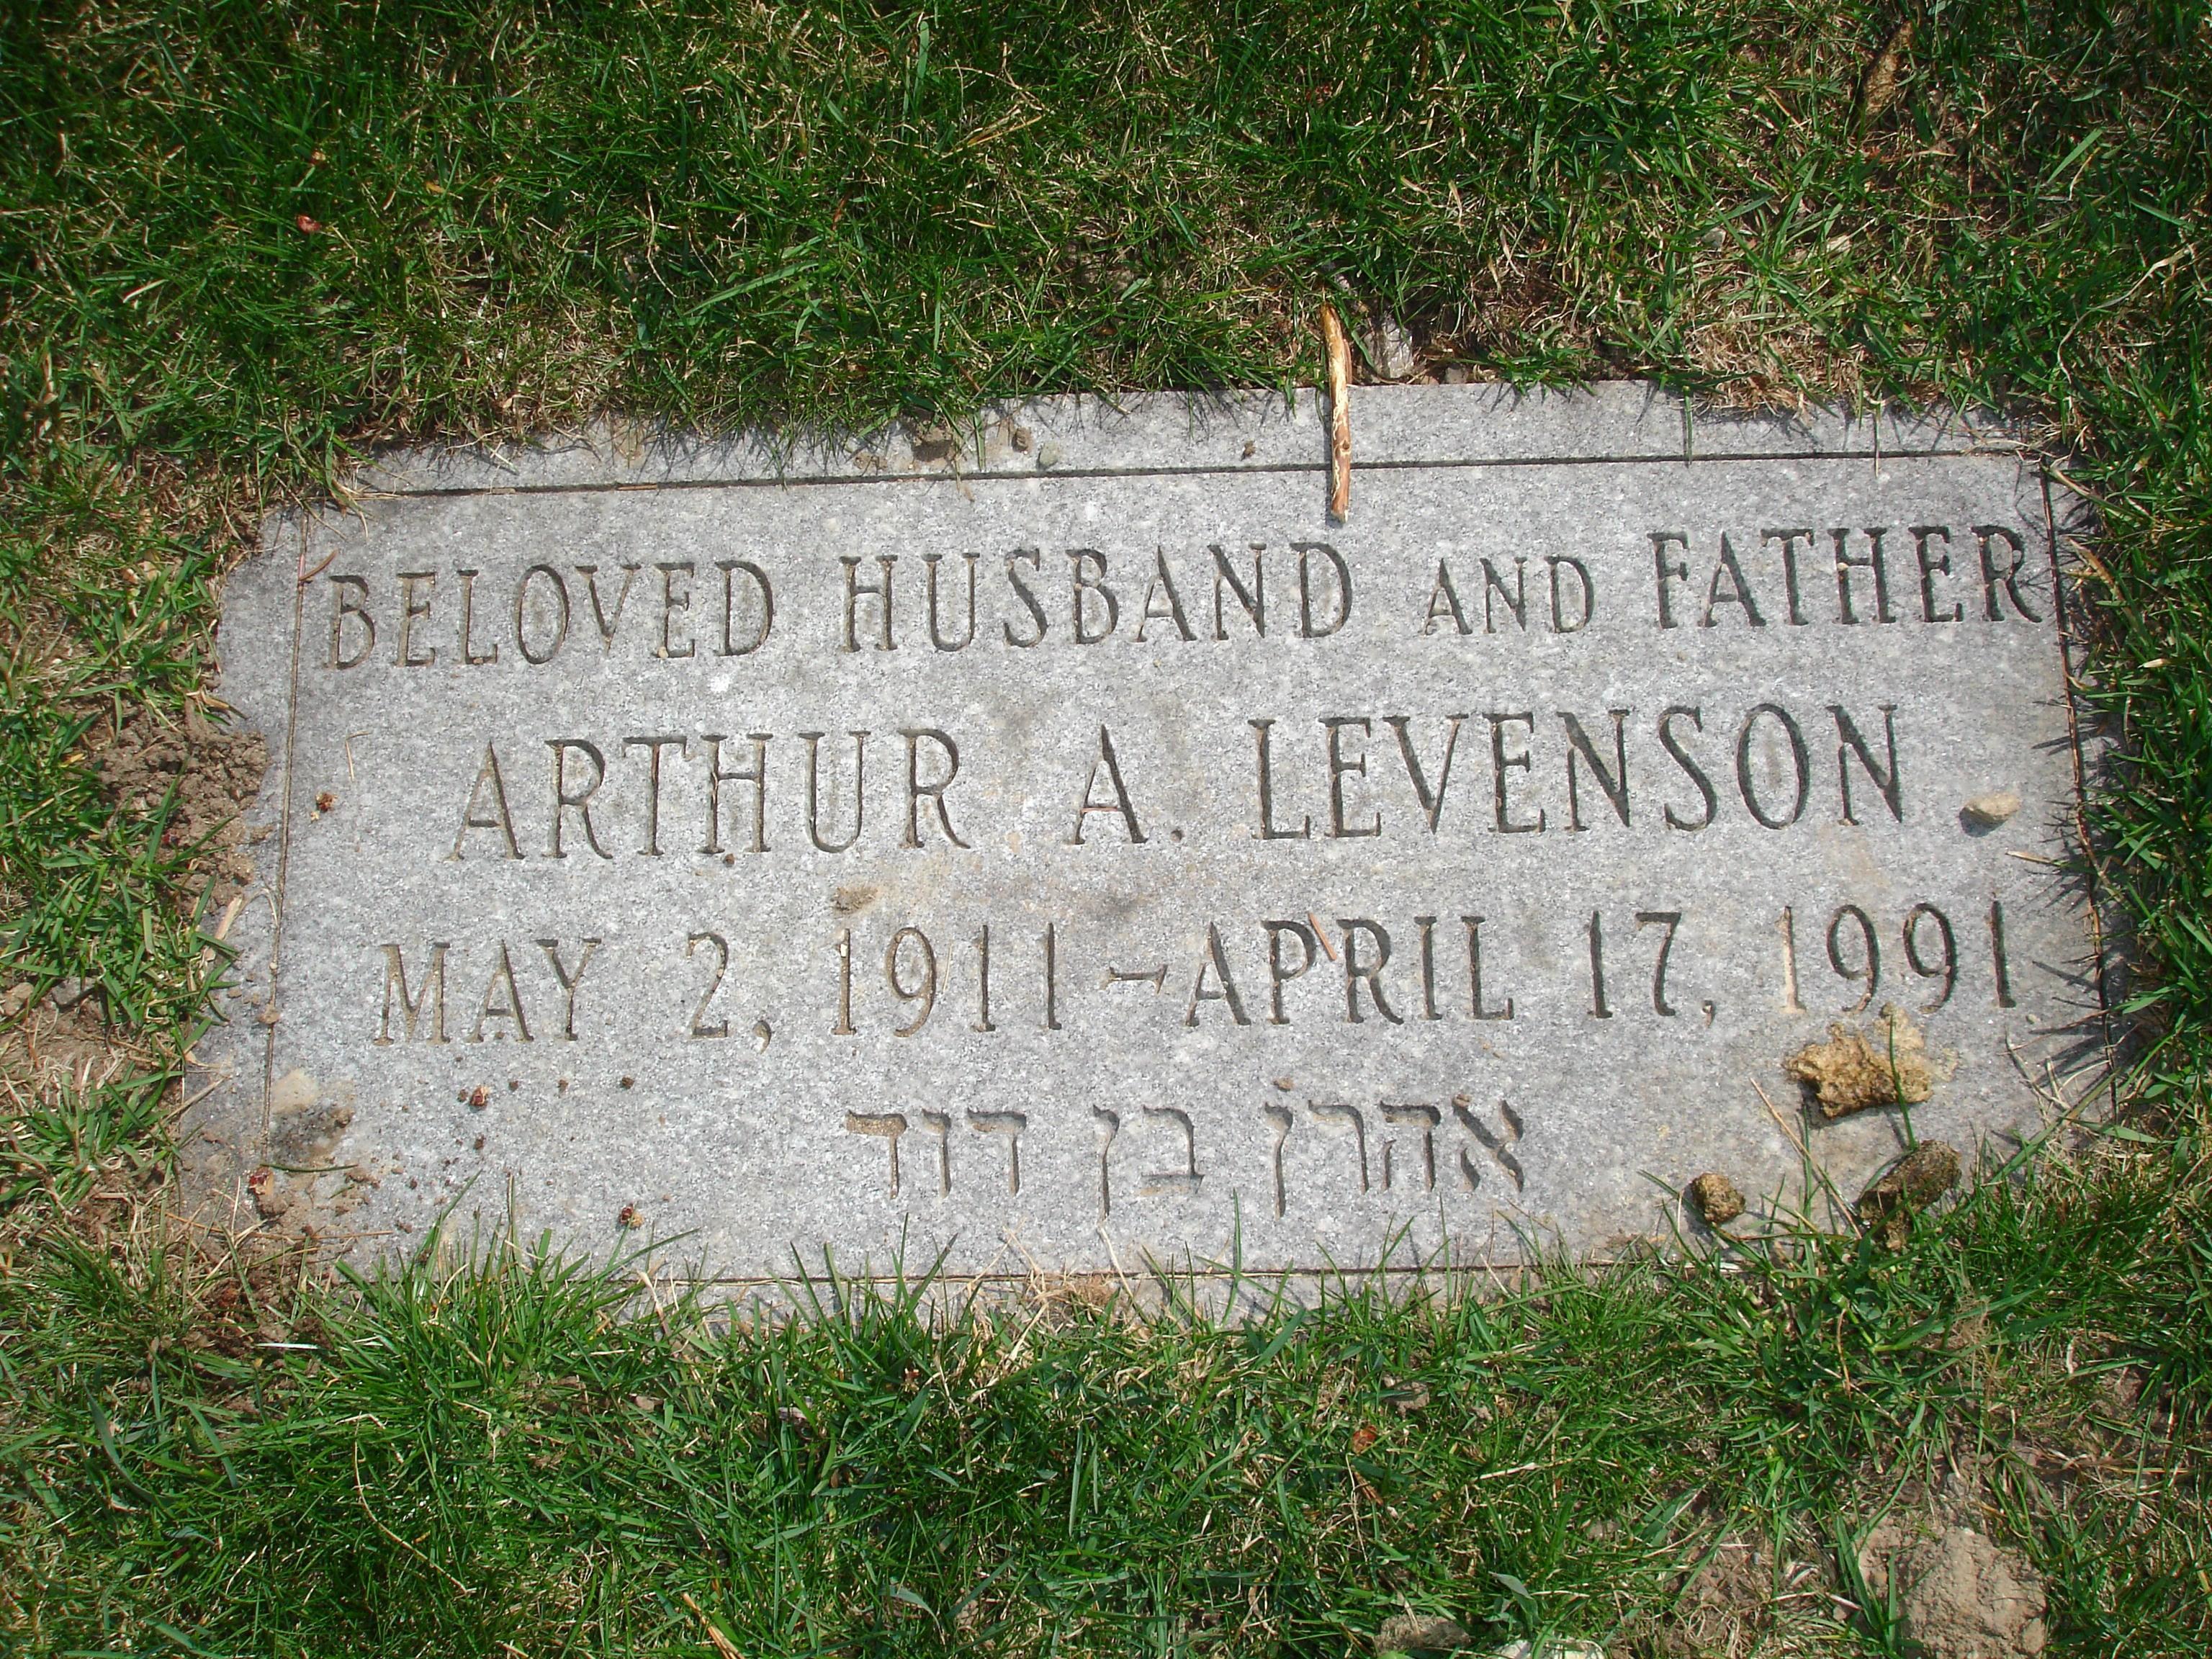 Arthur Dana Levenson